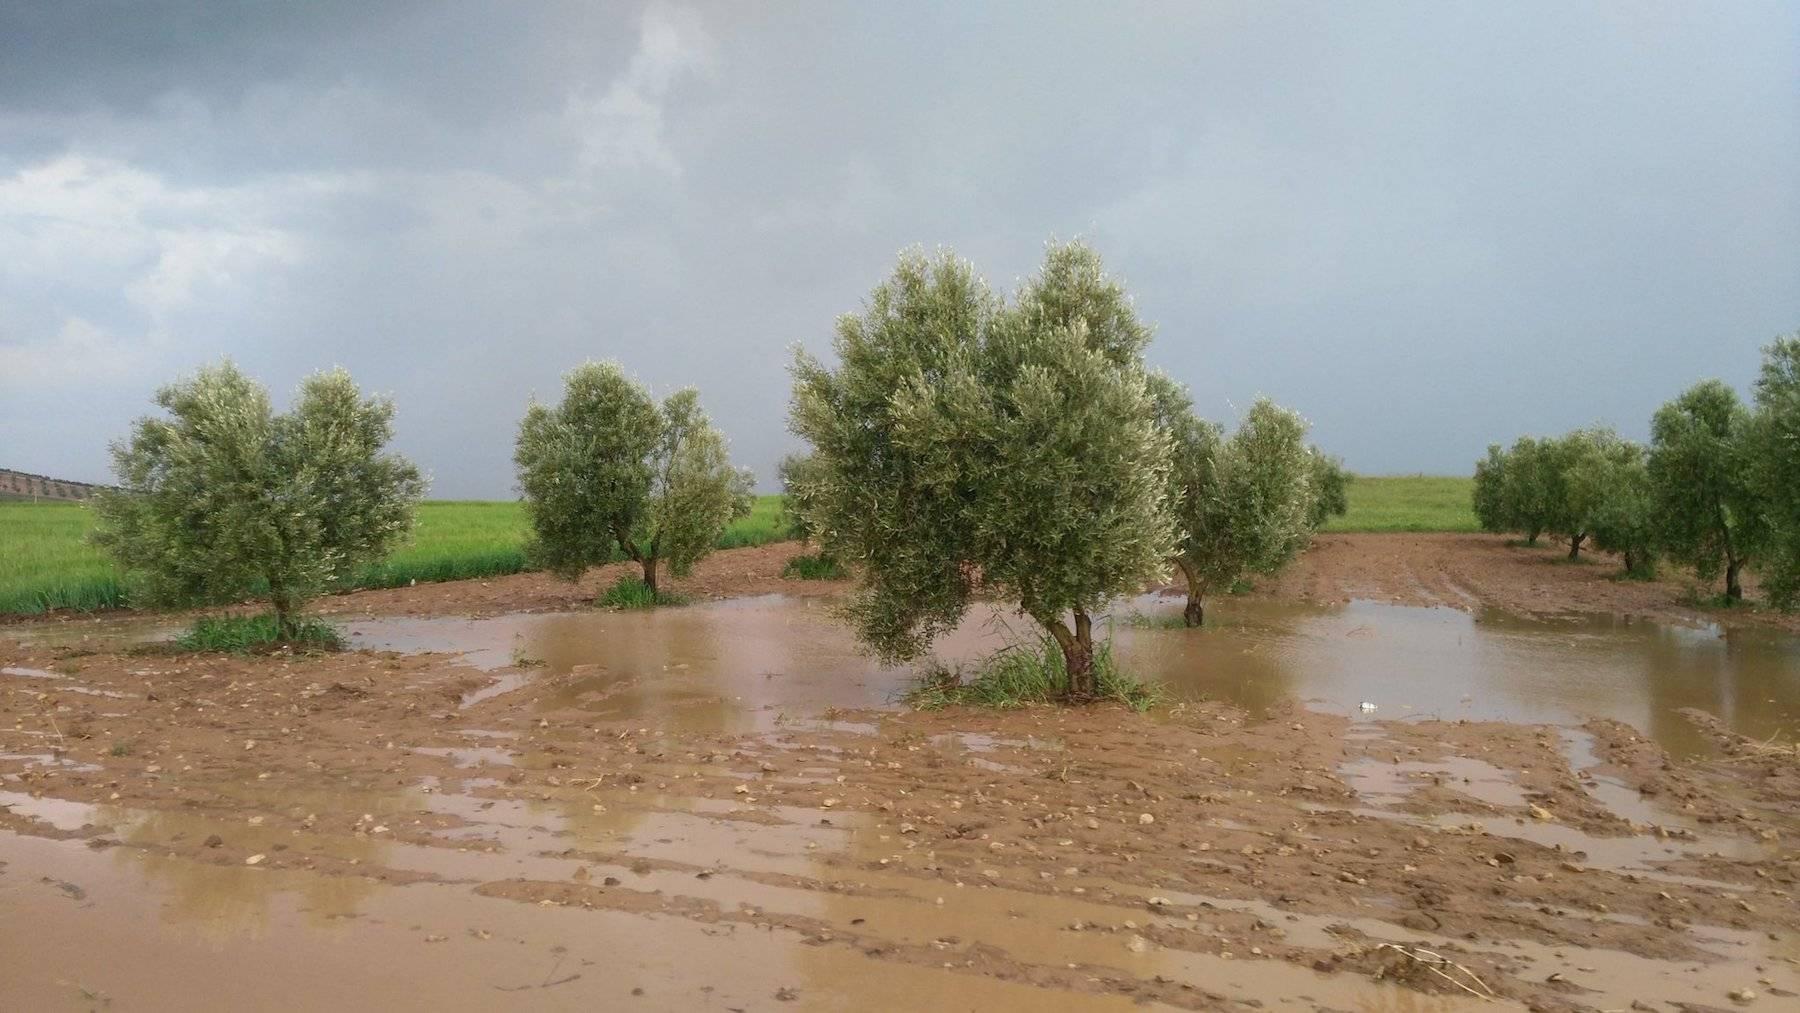 tromba agua herencia carreteras afectadas 2 1